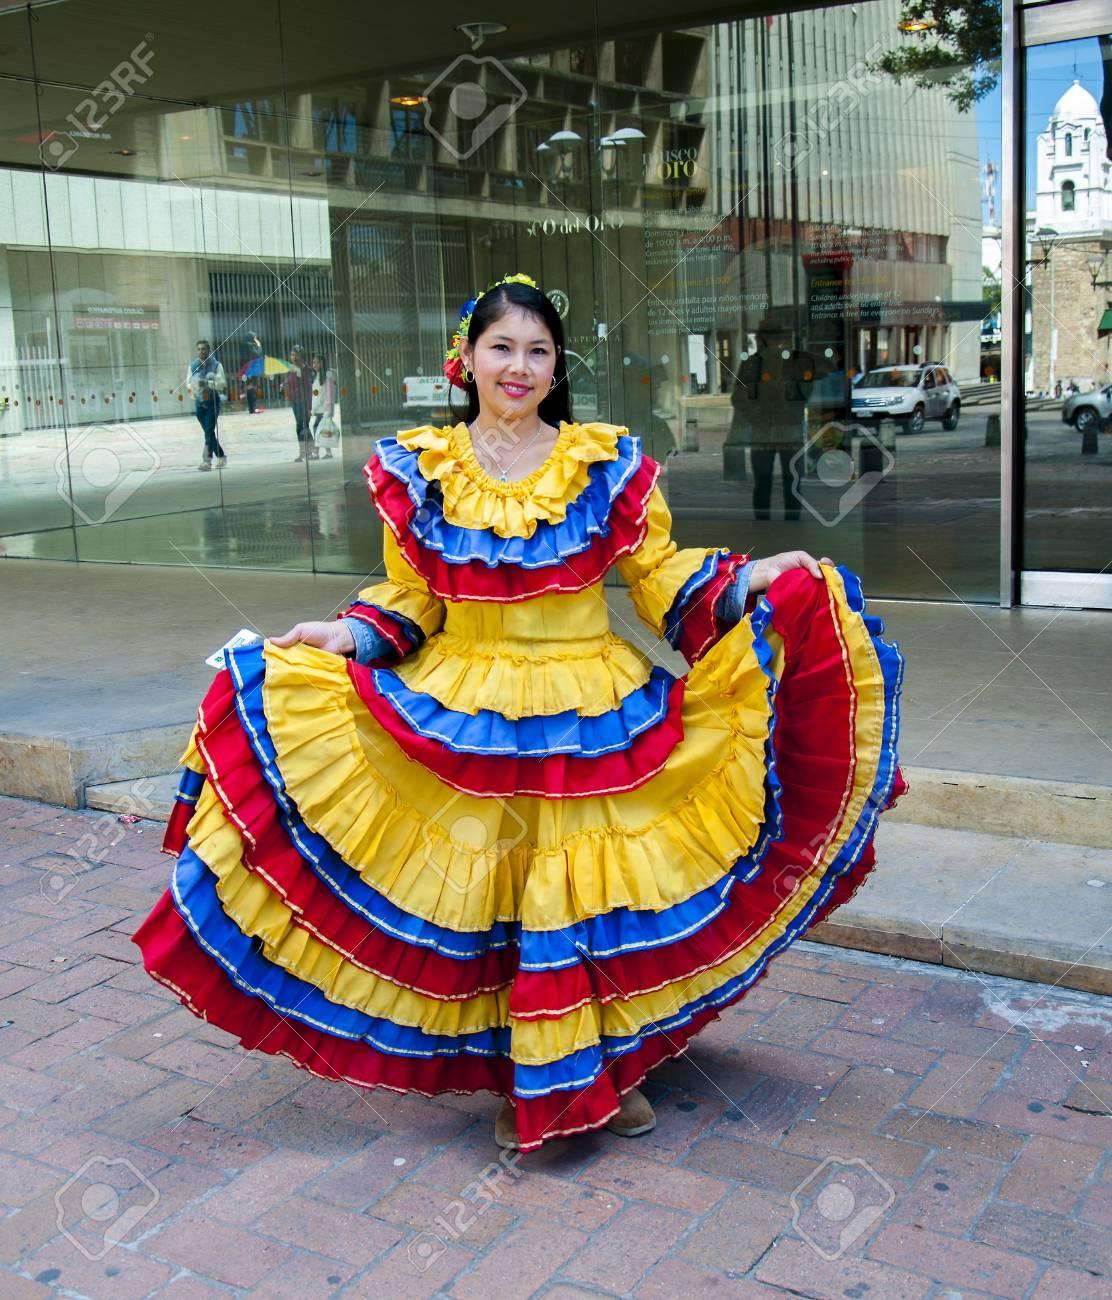 Femme colombien